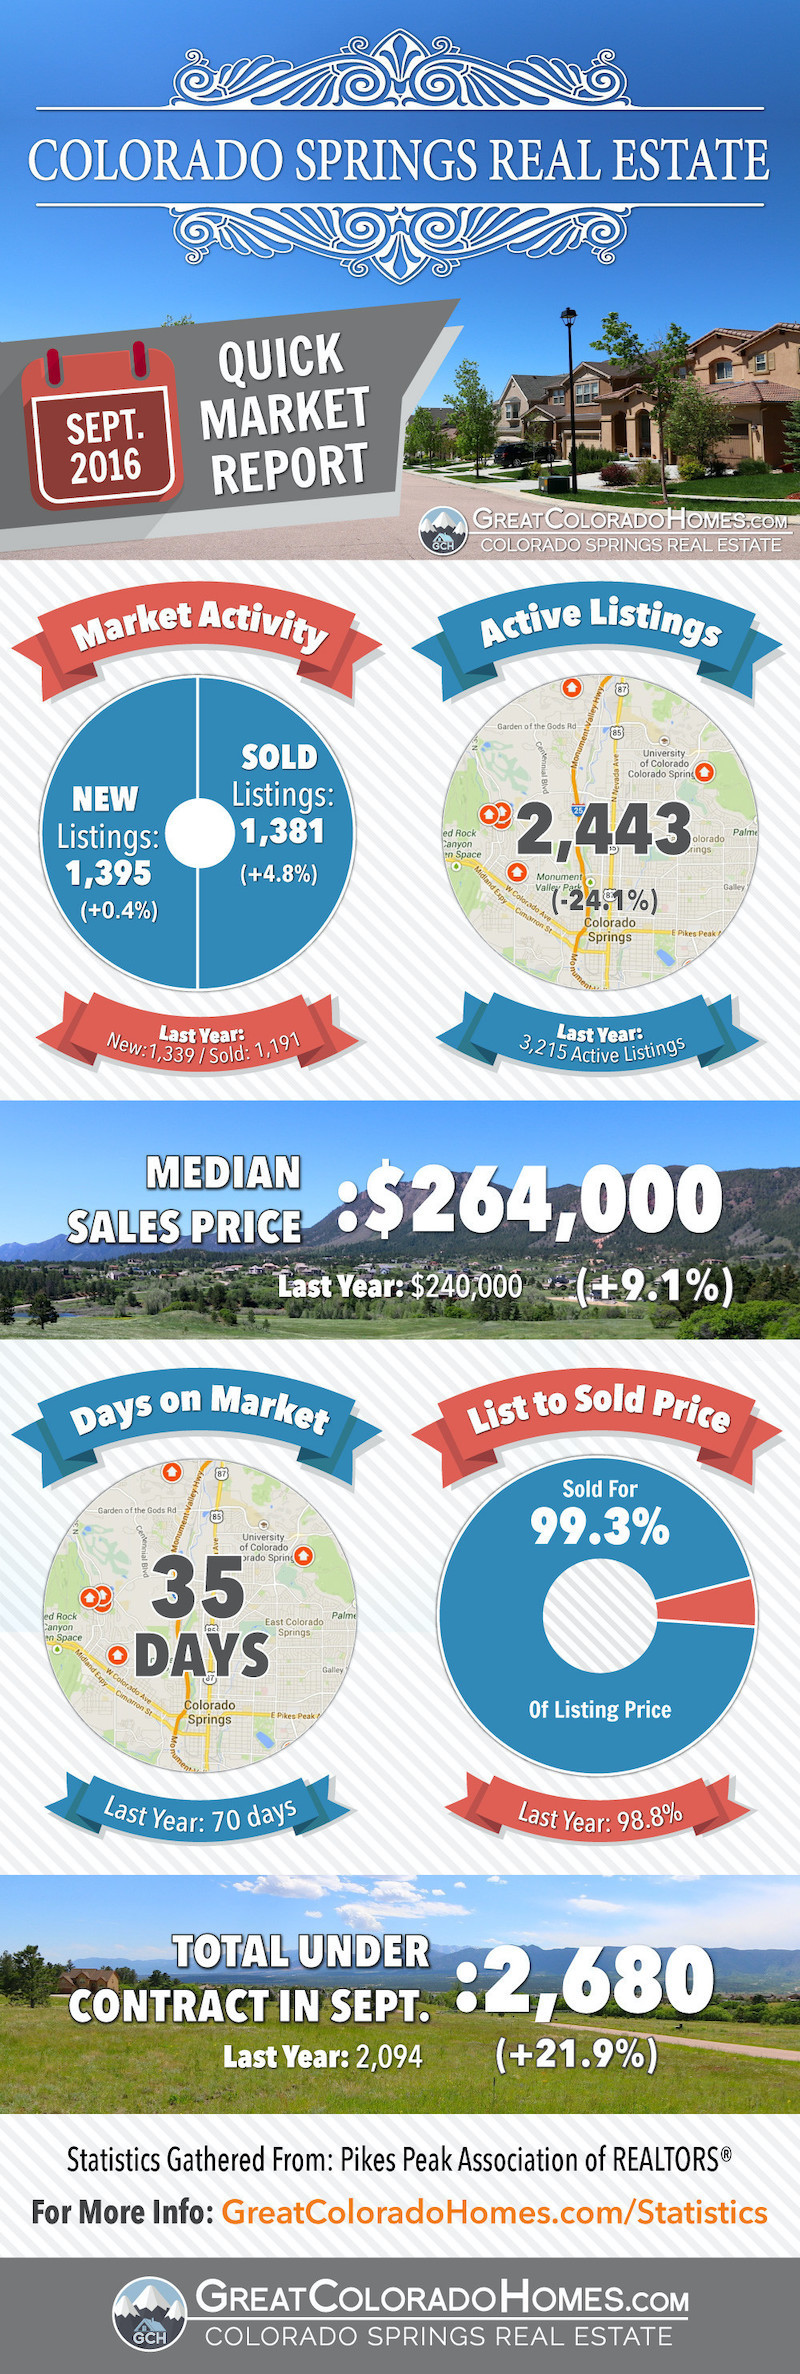 September 2016 Colorado Springs Real Estate Market Report